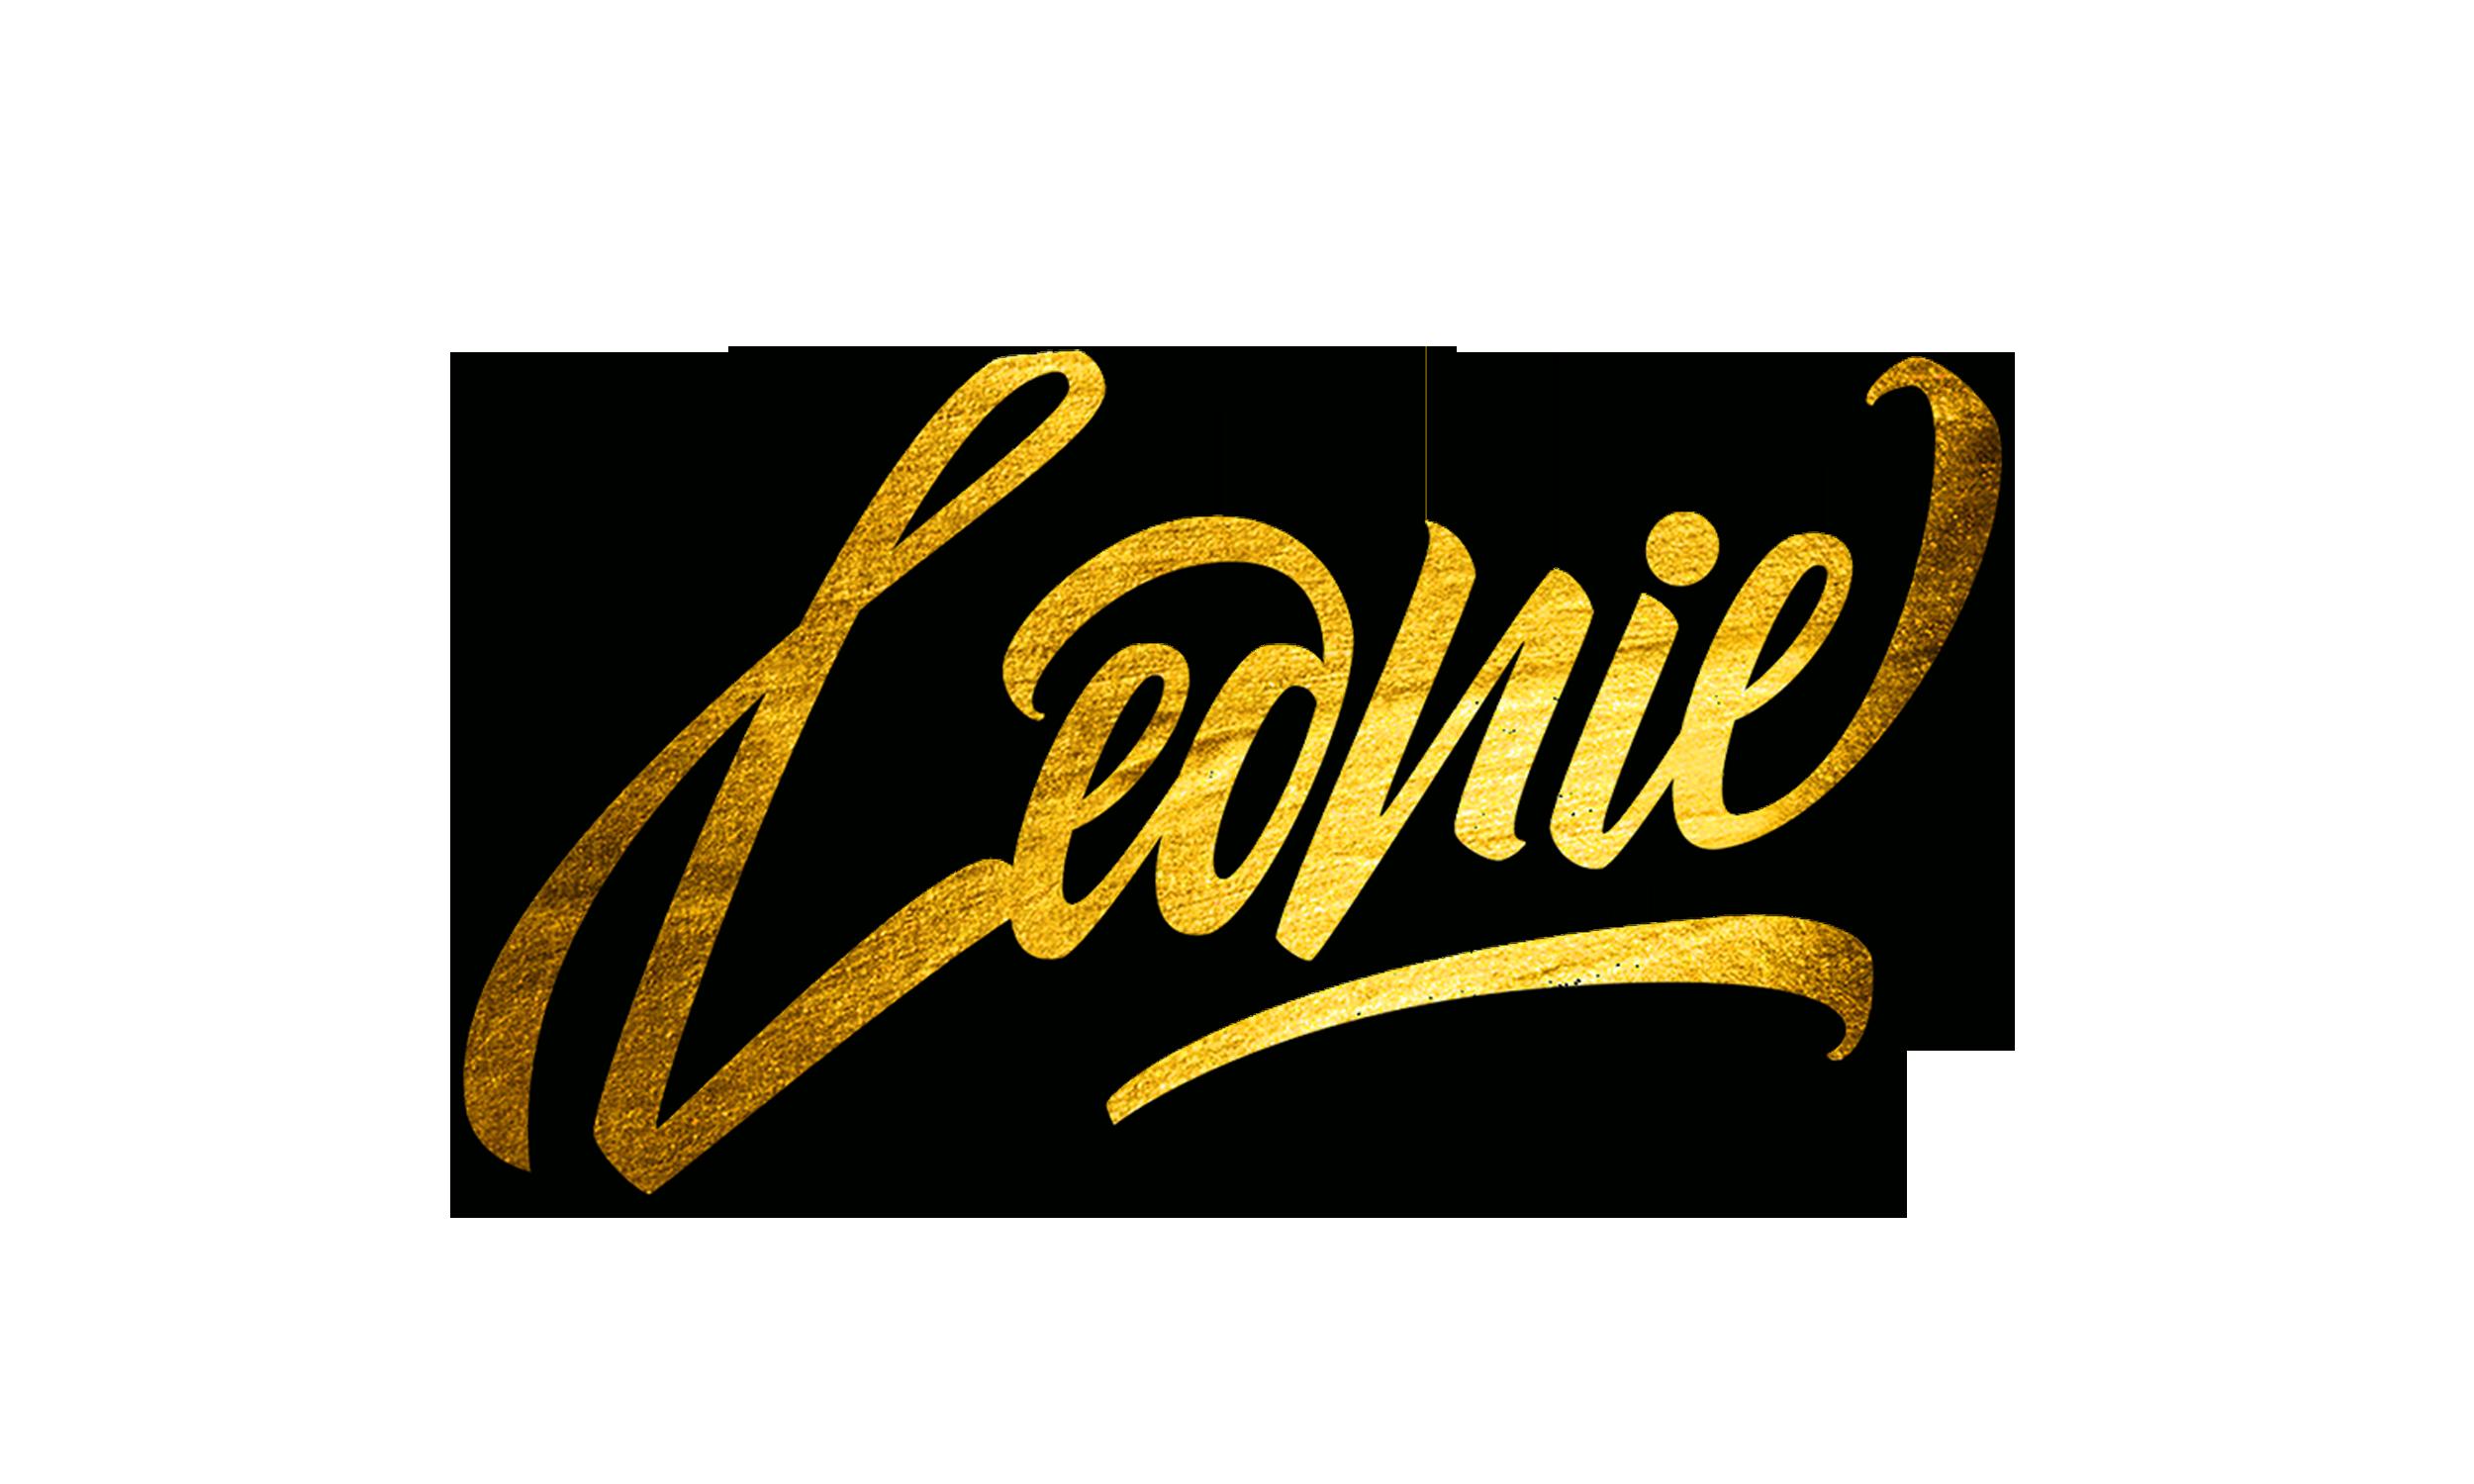 chuckchai_lettering_cancun_Leonie.png